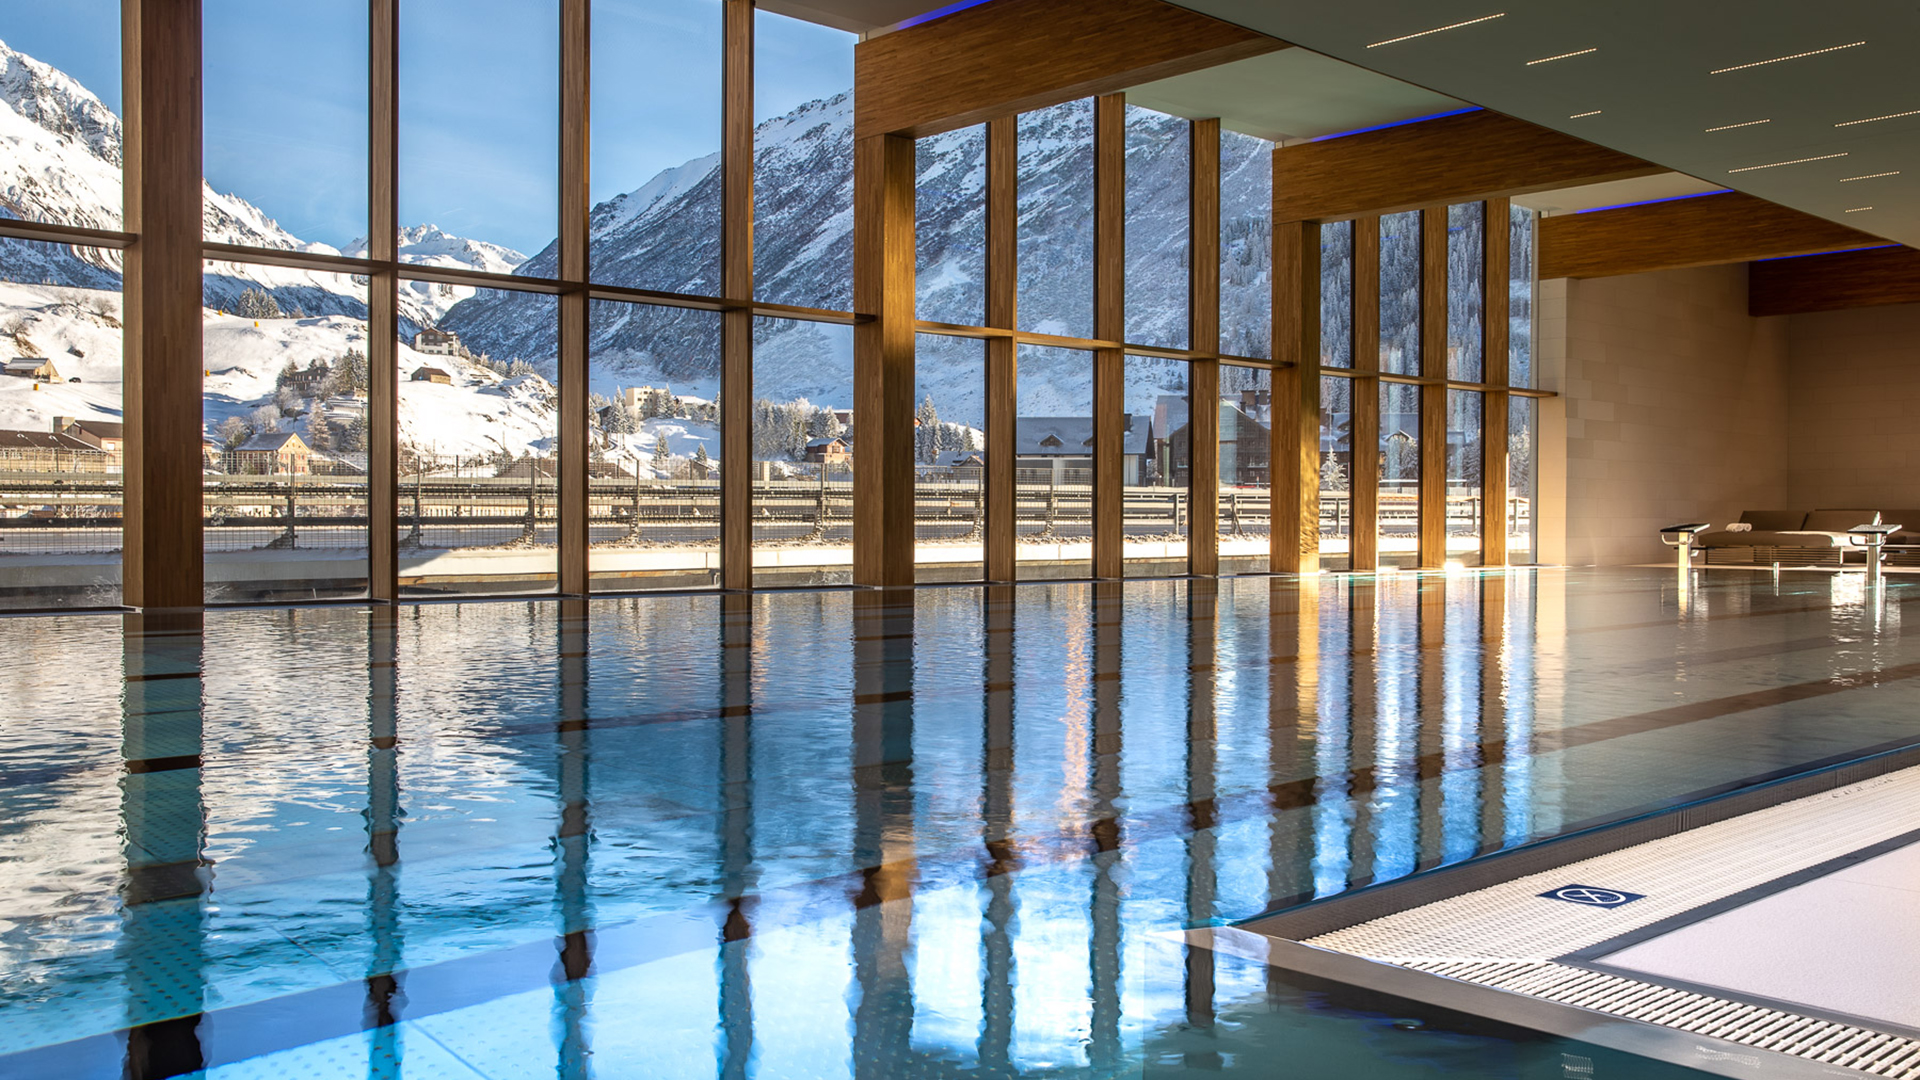 The Gotthard Lofts Apartments, Switzerland